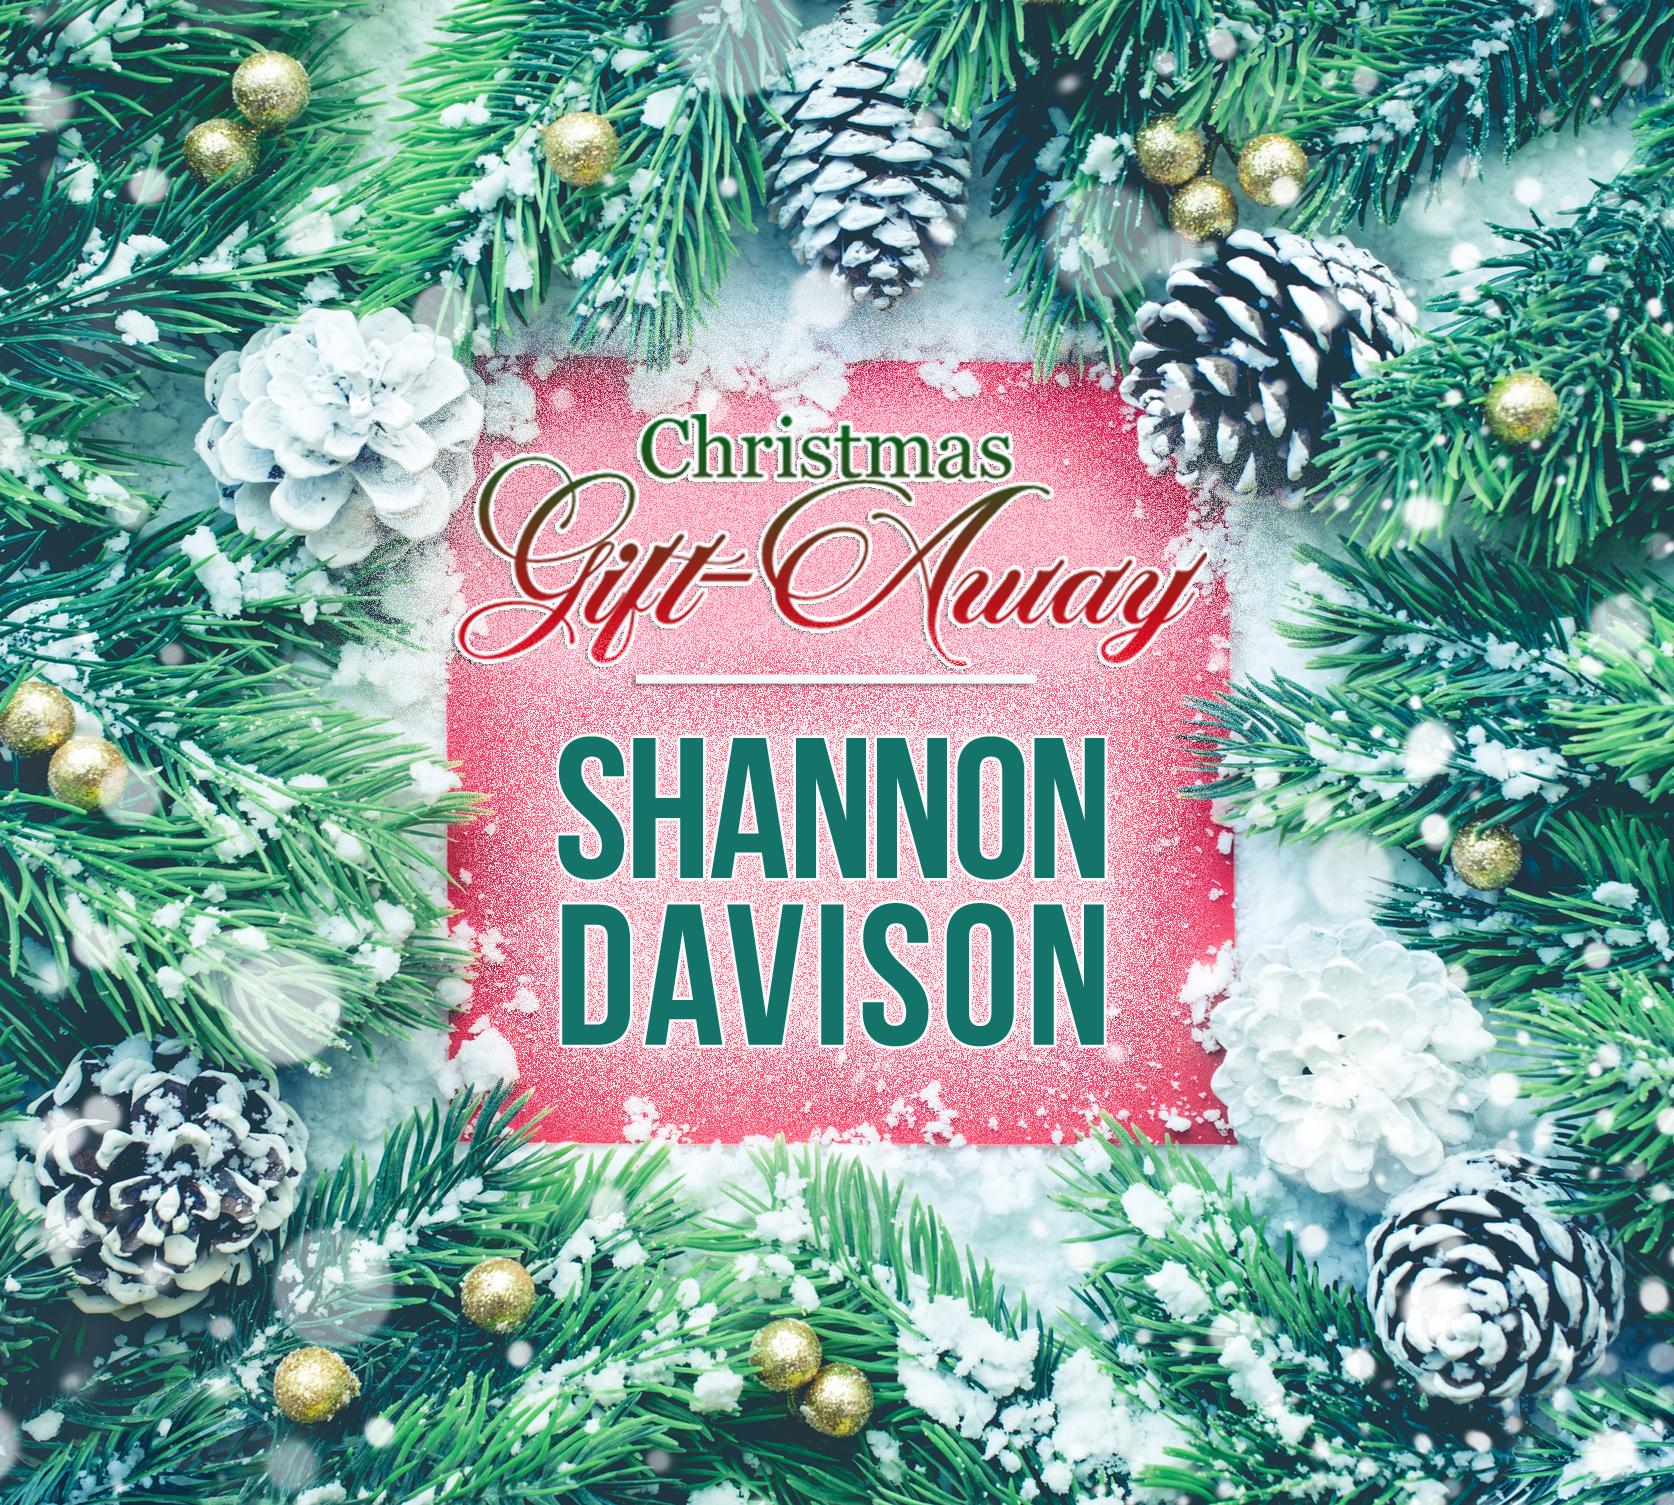 Christmas Gift Away Recipient #3 - Shannon Davison